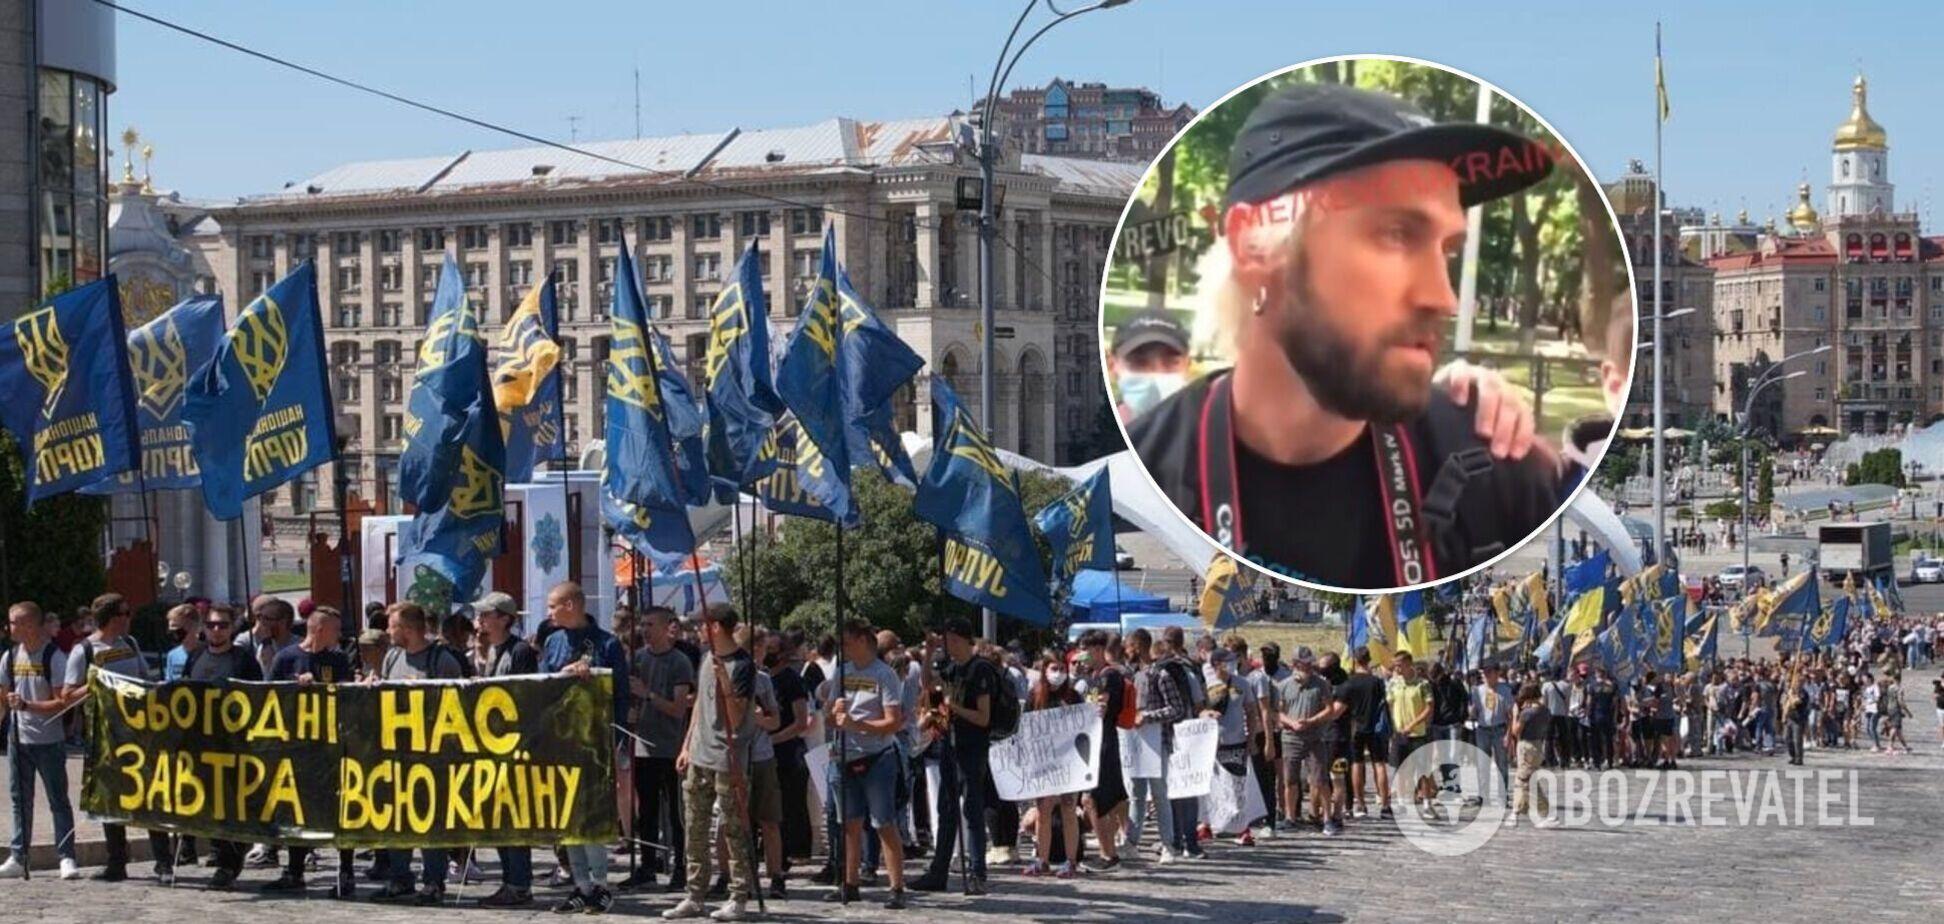 После акции протеста 'Нацкорпуса' неизвестные избили журналиста